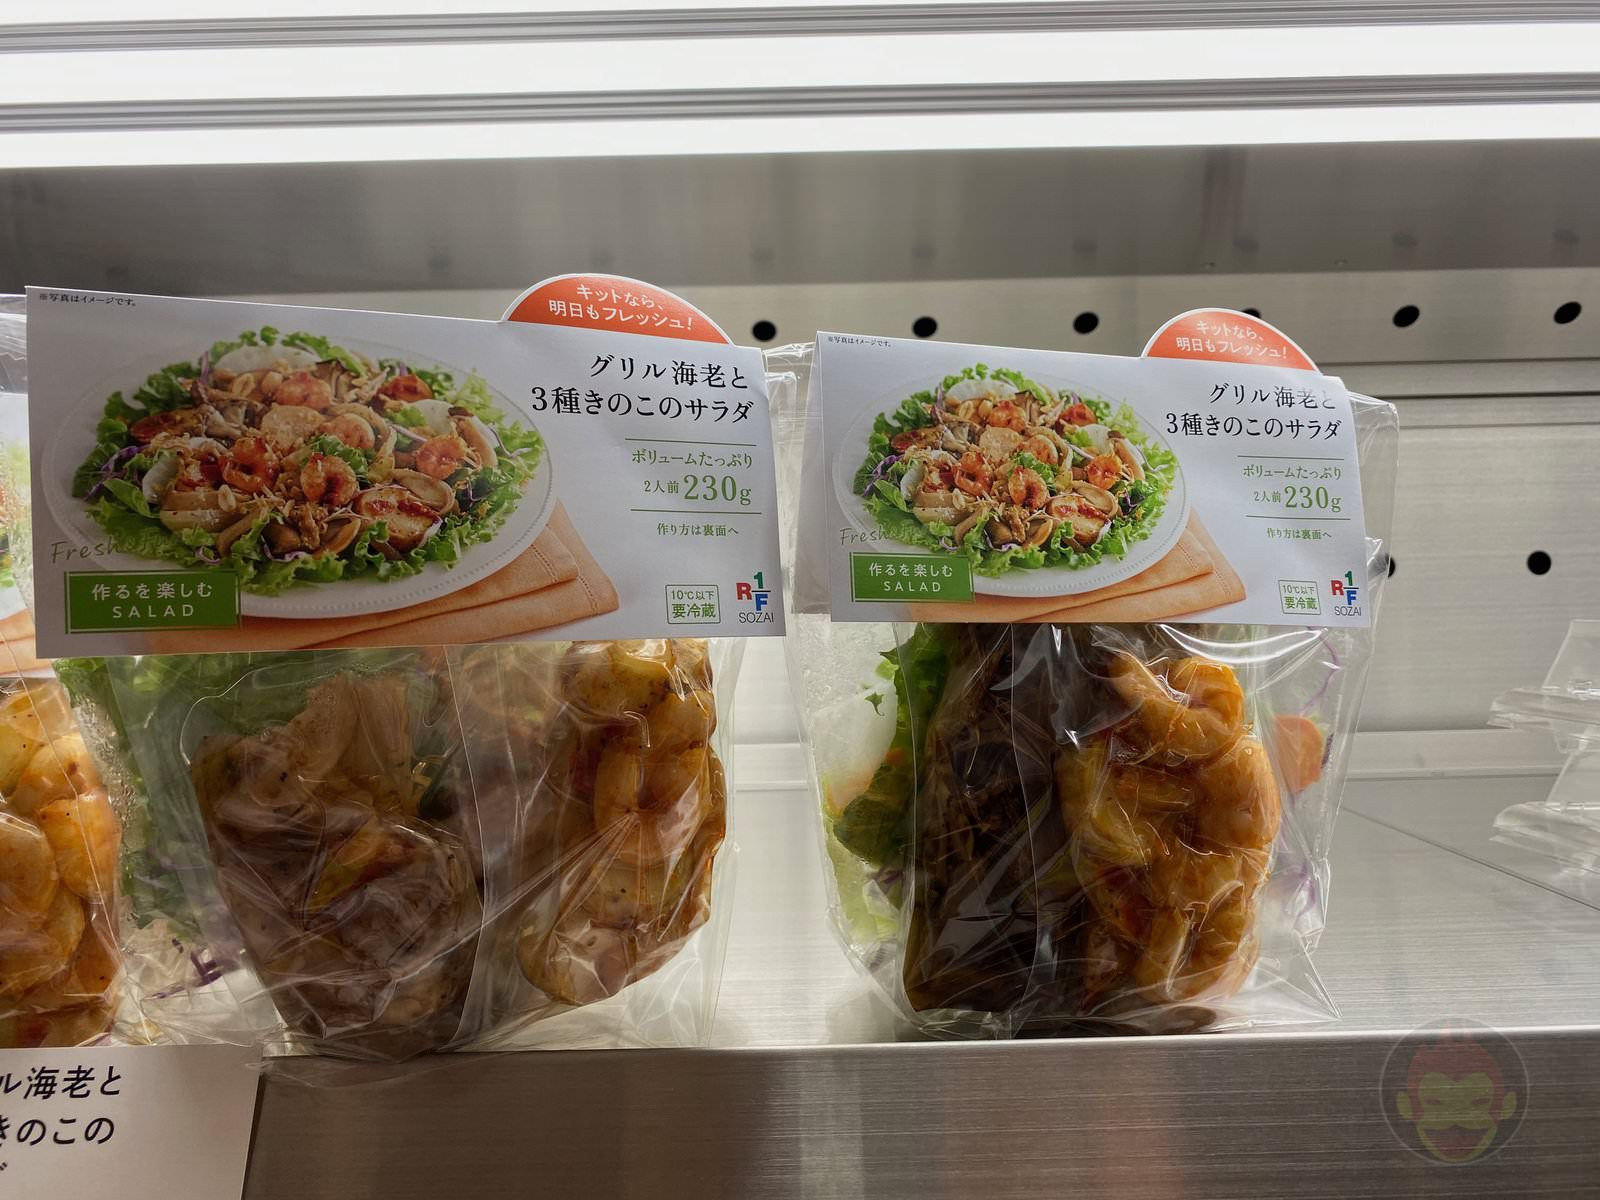 Shibuya-Scramble-Square-Food-I-Ate-139.jpeg